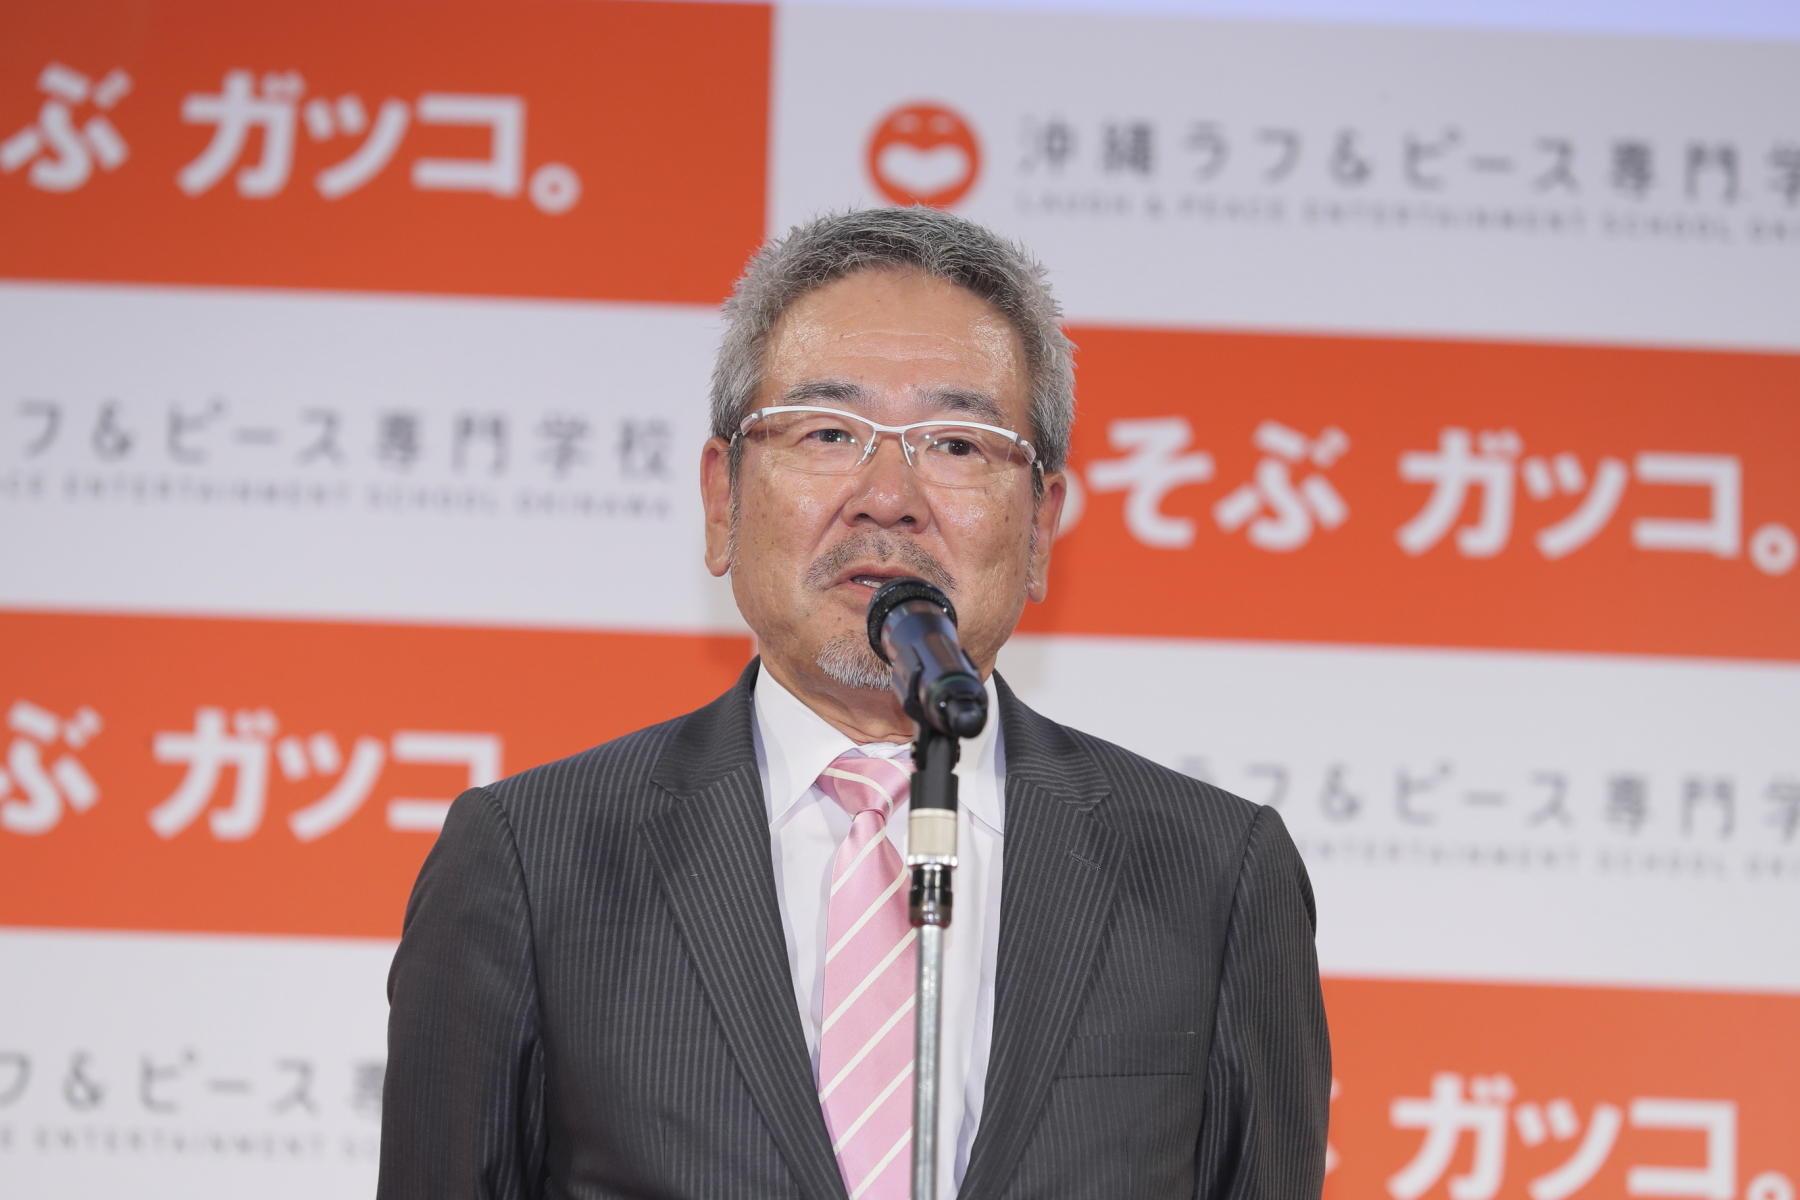 http://news.yoshimoto.co.jp/20171006102334-e6edd02ee7d0afa33b4f86e8c6bca7b617a30fa1.jpg